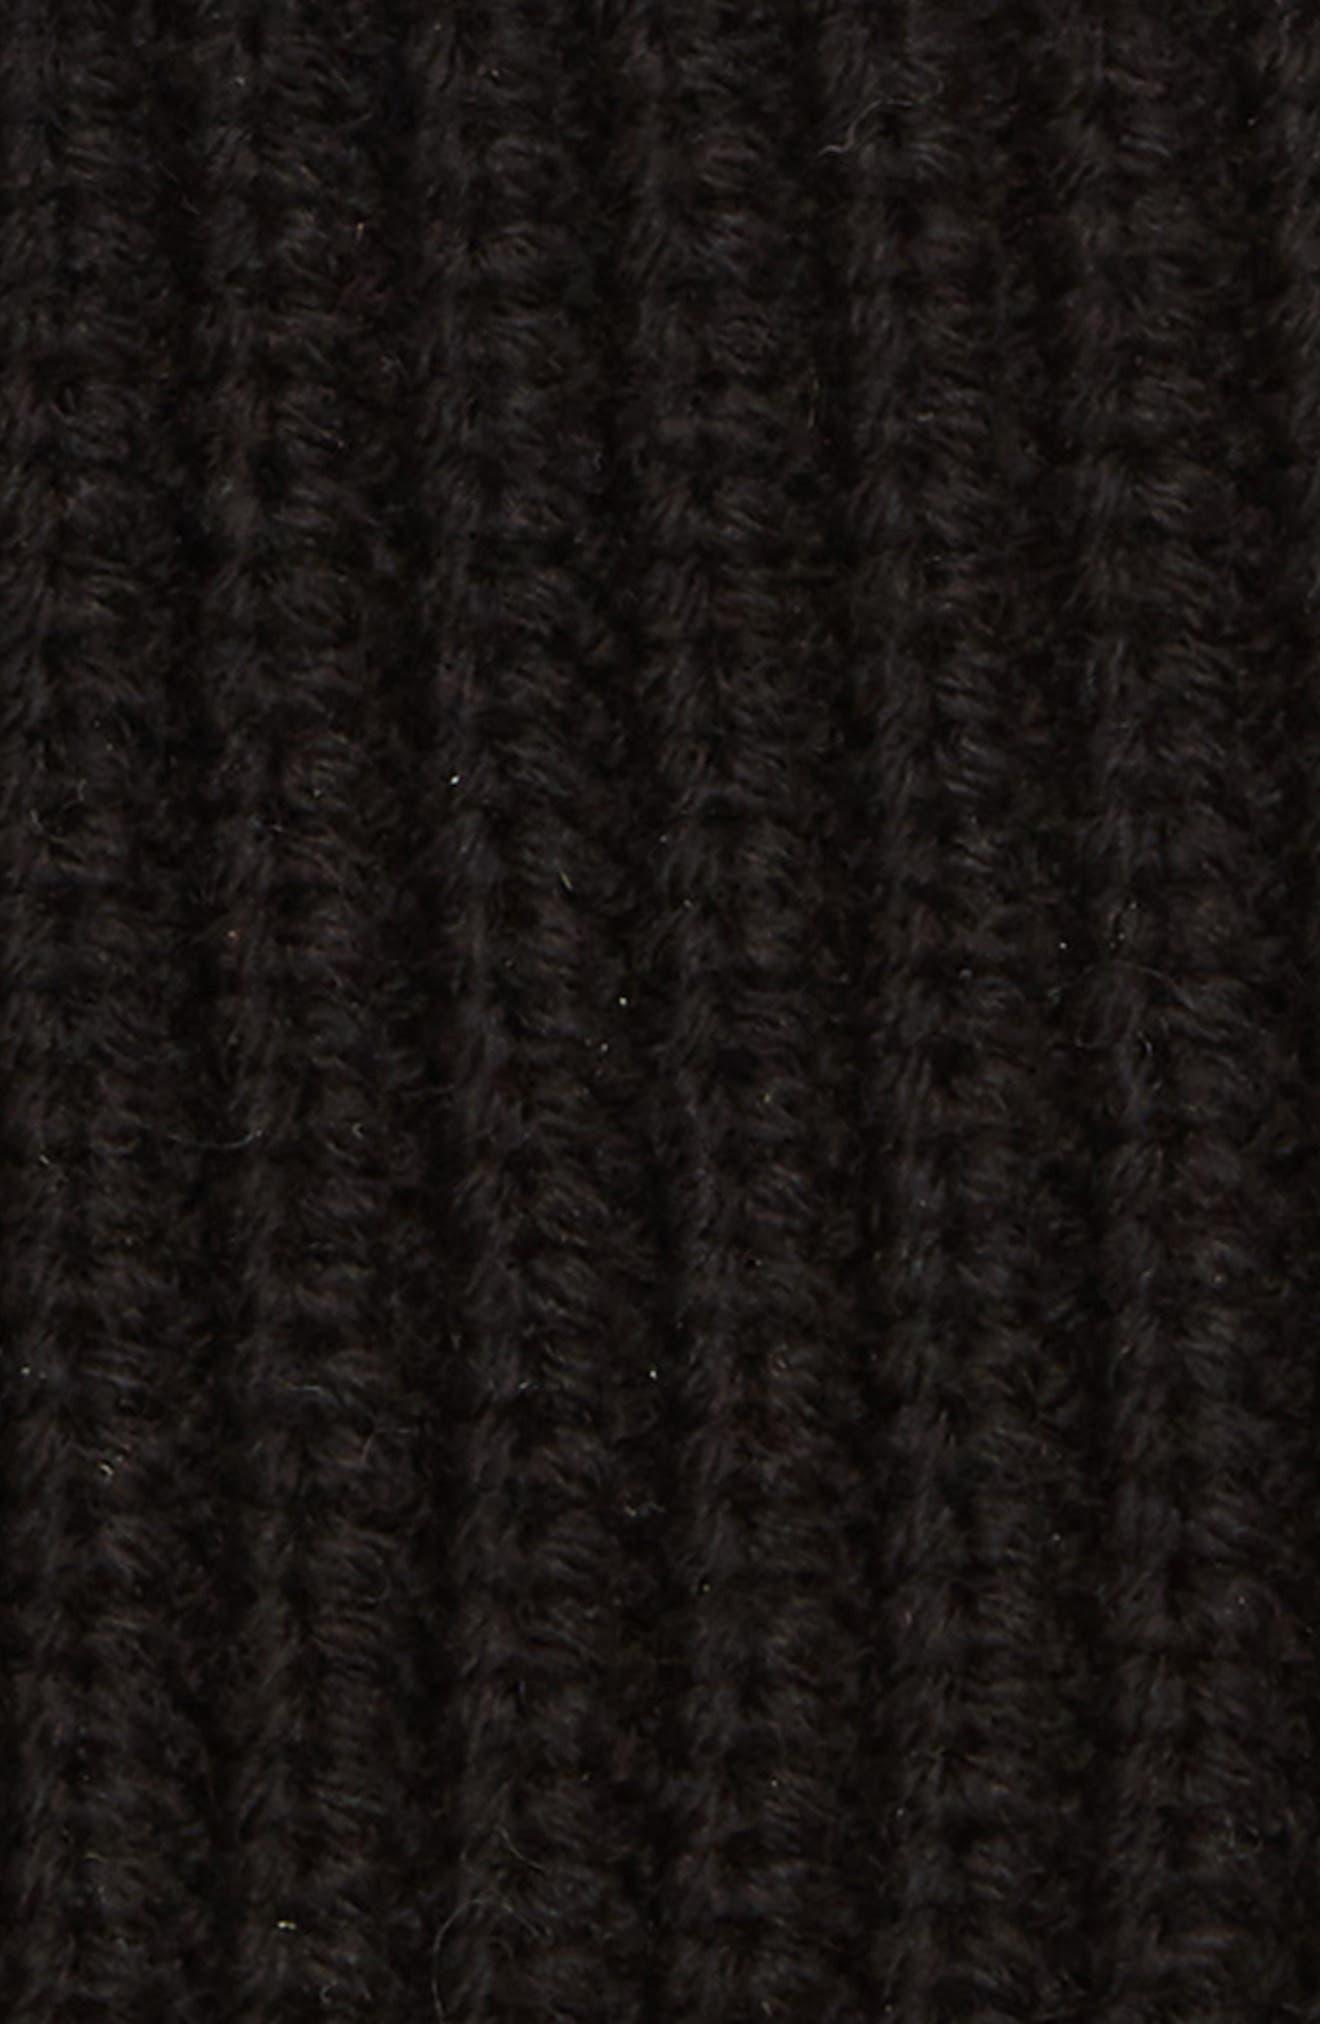 Half Cardigan Stitch Beanie,                             Alternate thumbnail 2, color,                             BLACK